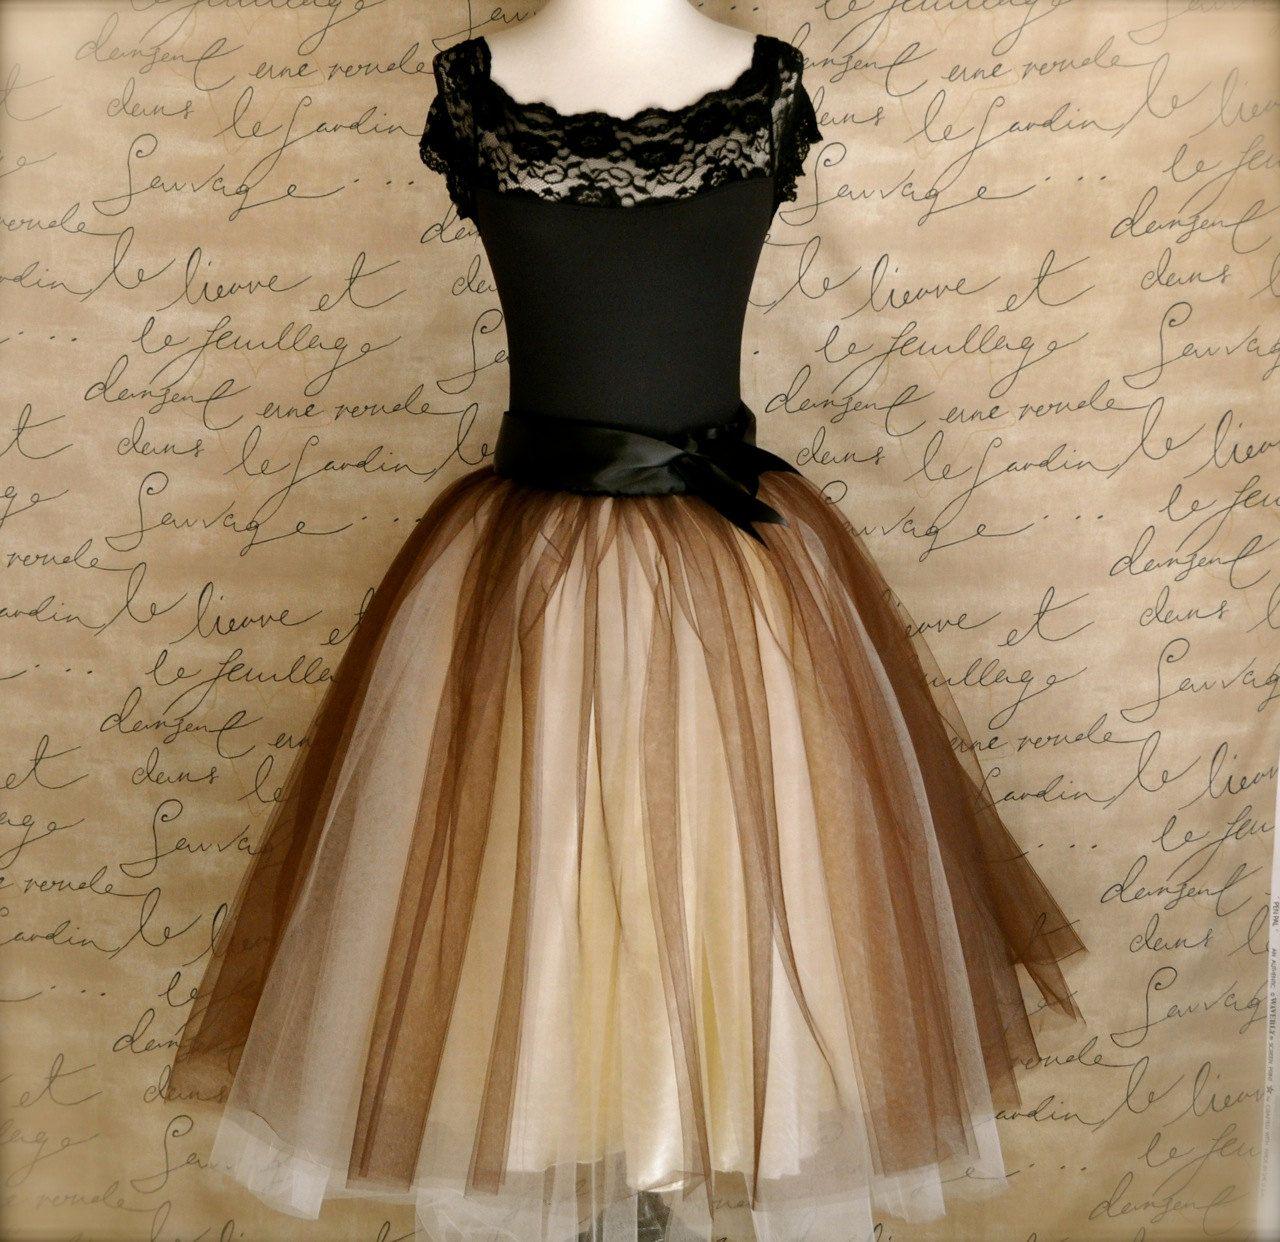 9f33fa0fbe Black and tiffany blue aqua tutu skirt for women. Ballet glamour. Retro  look tulle skirt.